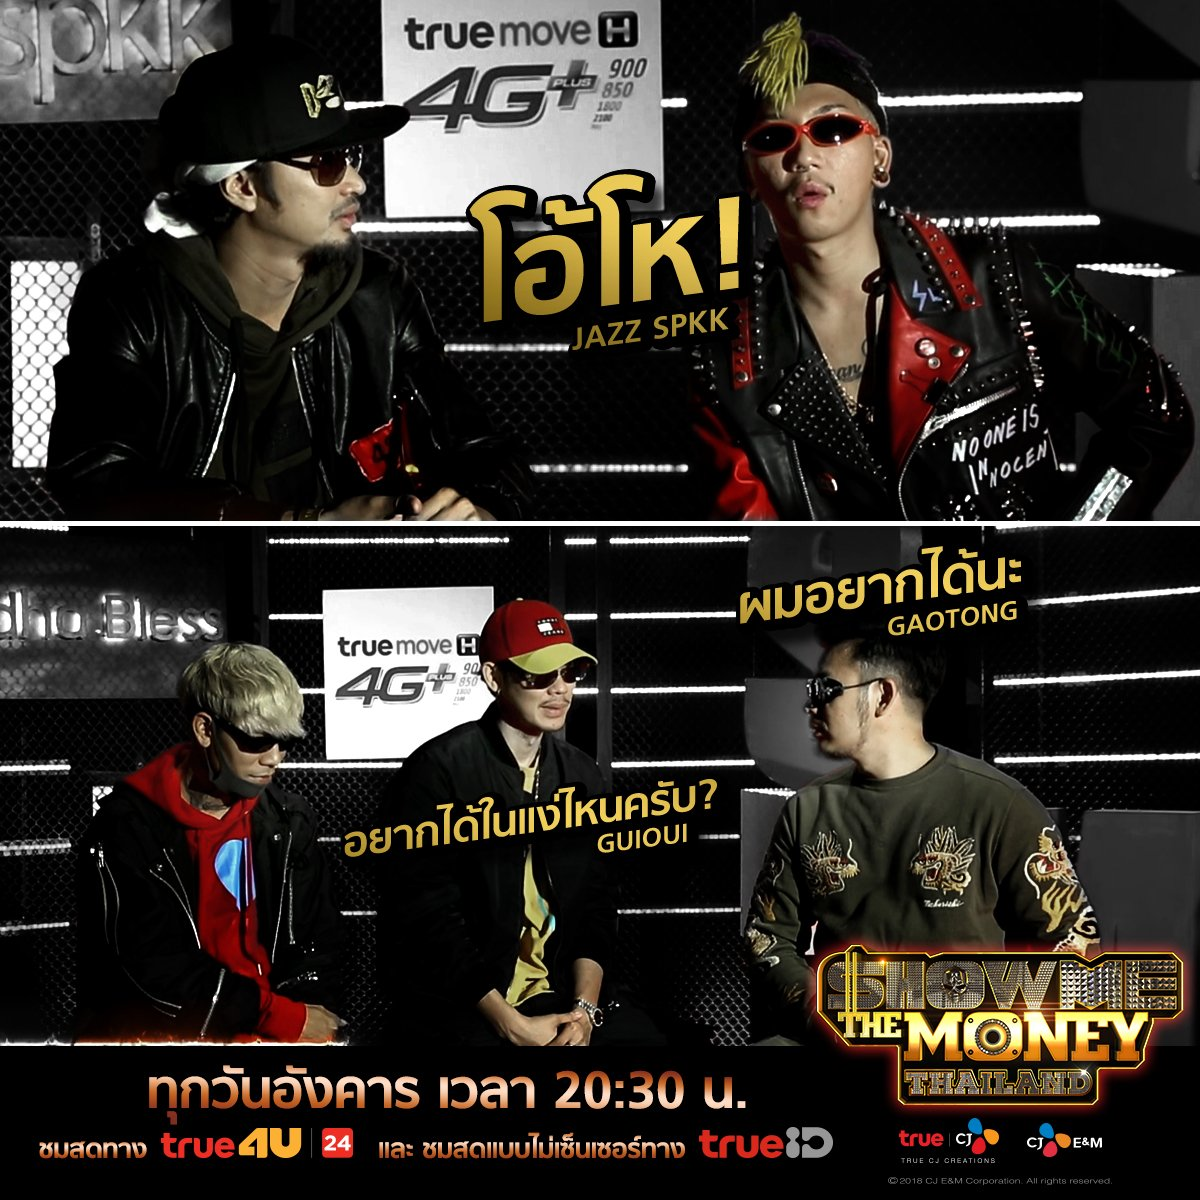 show me the money thailand ย้อน หลัง